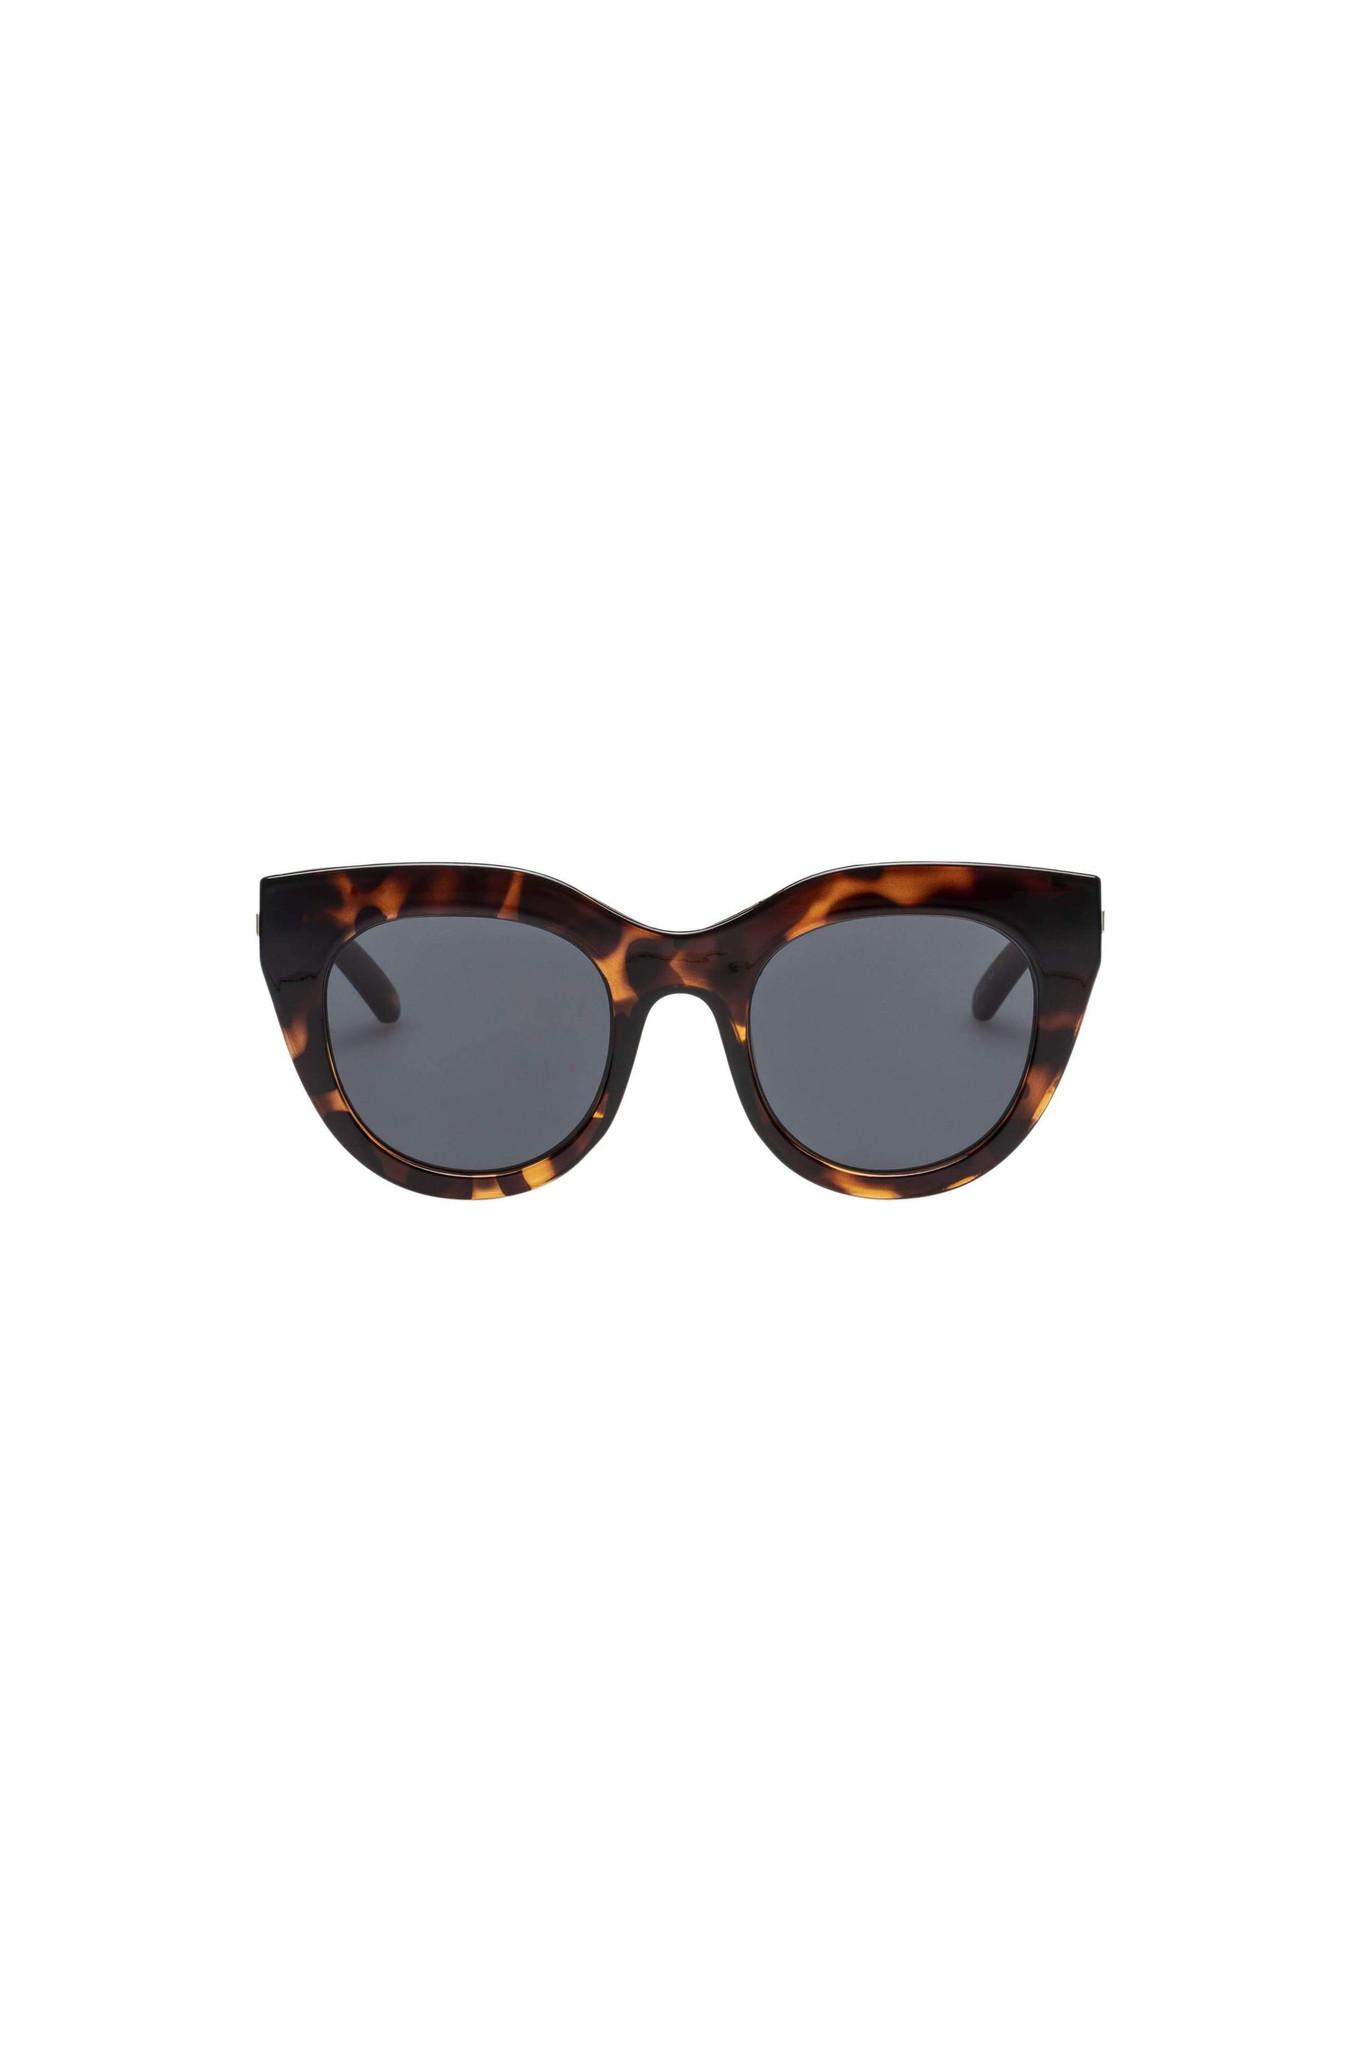 Air Heart Sunglasses - Tortoise-1